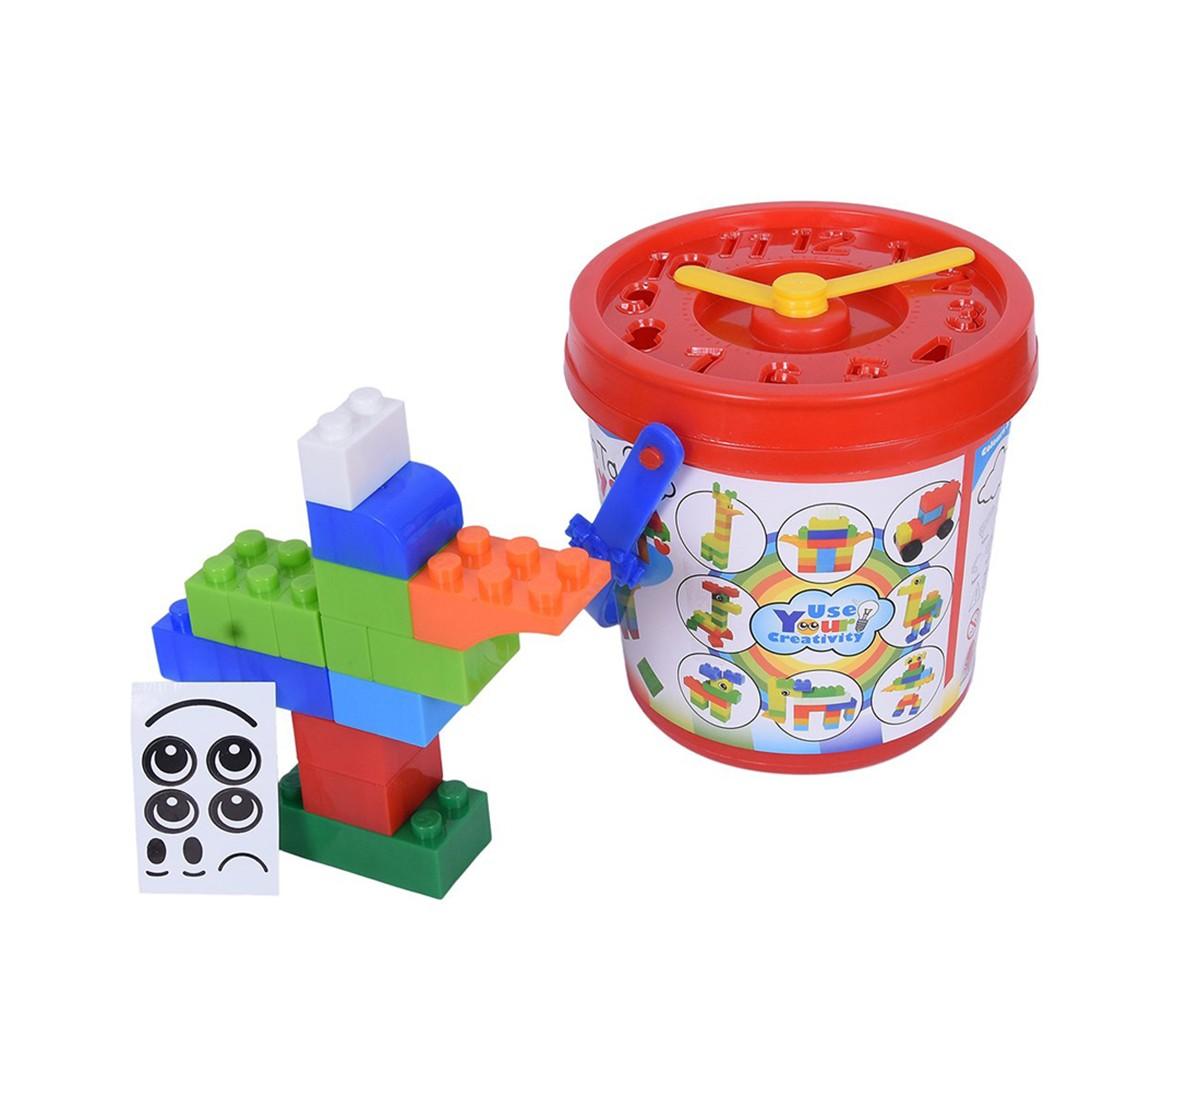 Sunta Basic Blocks, Multi Color (88 Pieces) Generic Blocks for Kids age 3Y+